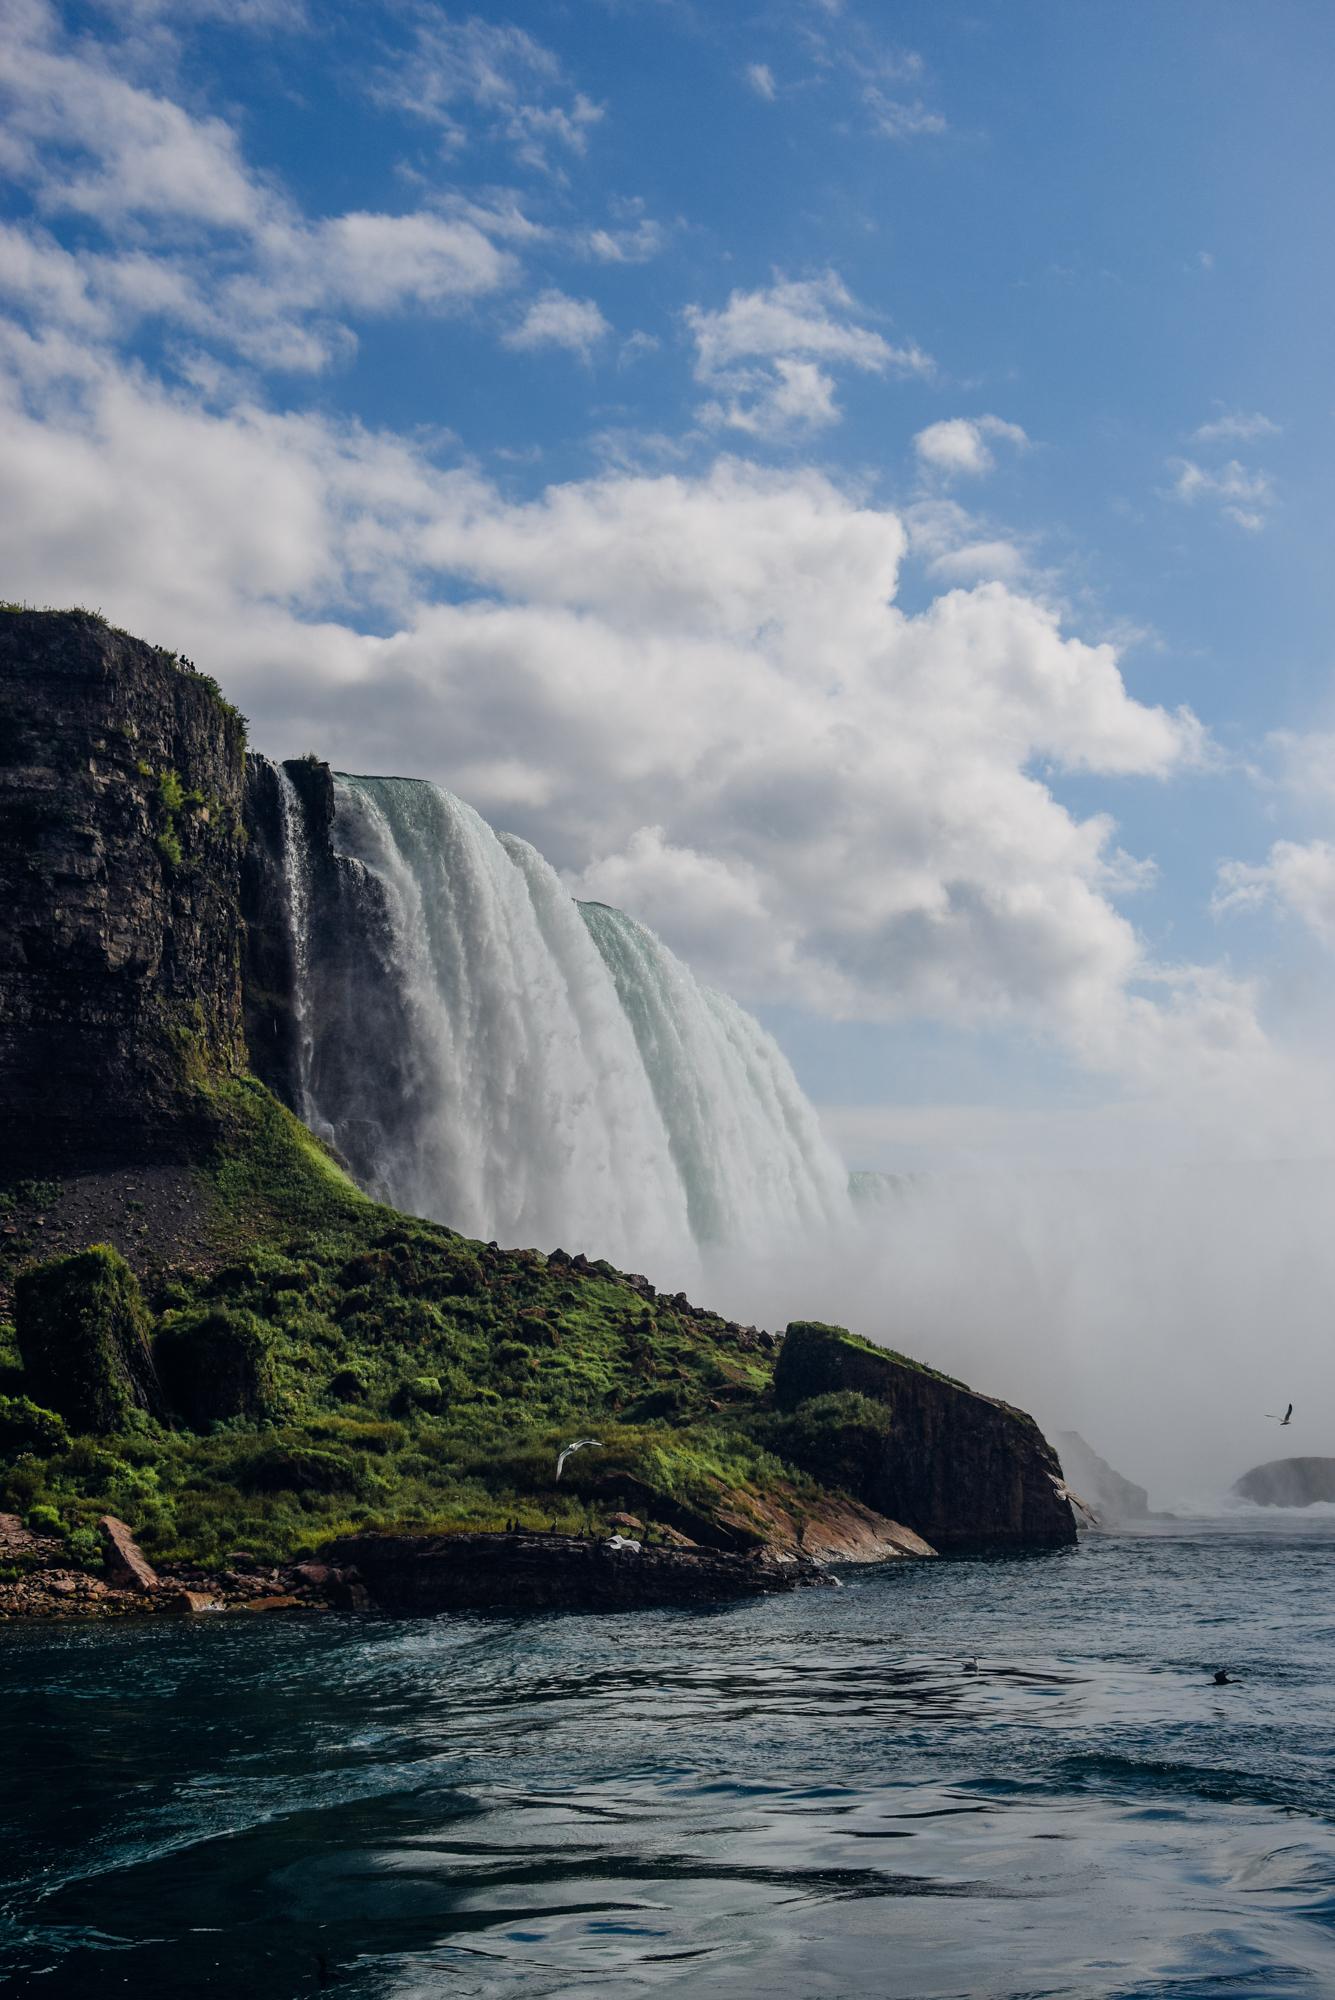 Niagara Falls New York USA | A Beautiful Distraction by Ruo Ling Lu